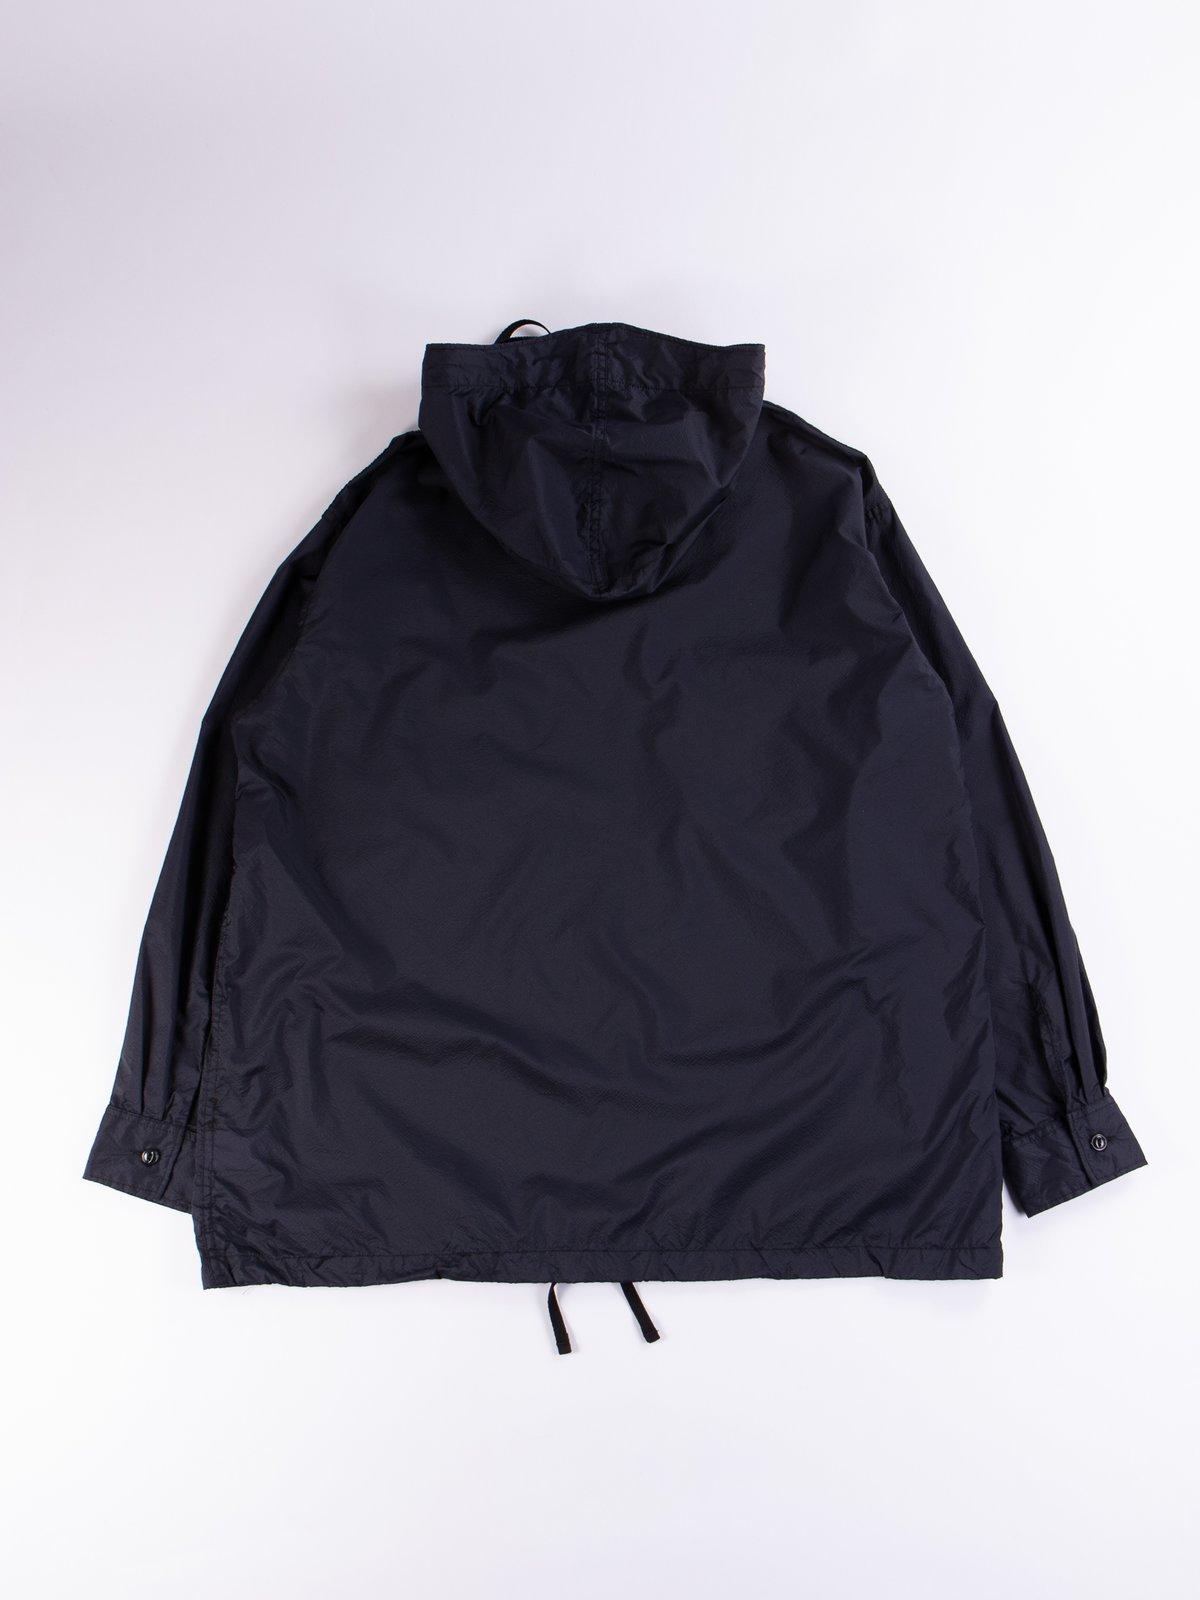 Dark Navy Nylon Micro Ripstop Cagoule Shirt - Image 6